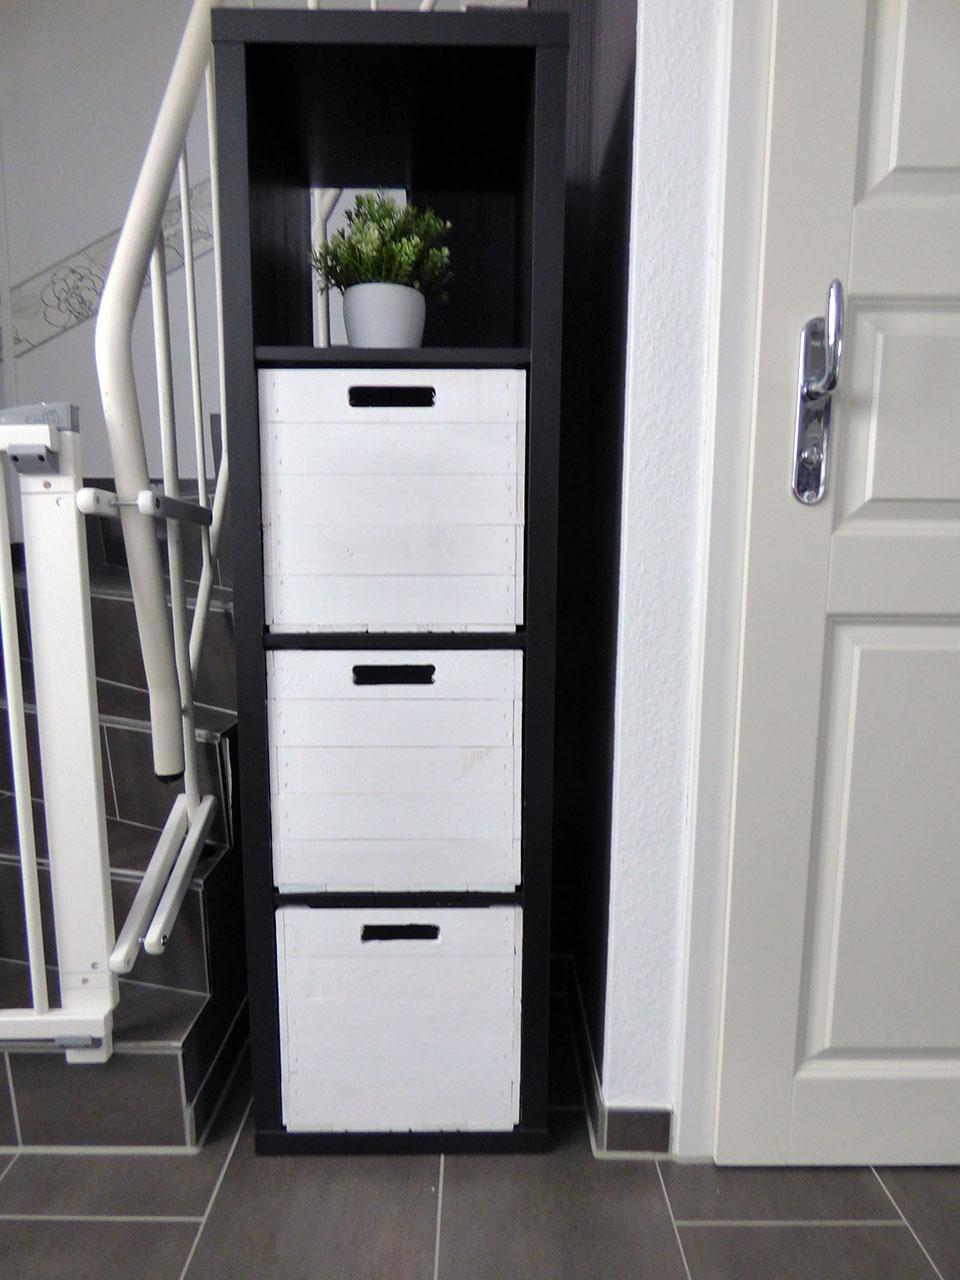 farbige produkte holzkiste shabby wei f r kallax regale 33x38x33cm obstkisten. Black Bedroom Furniture Sets. Home Design Ideas